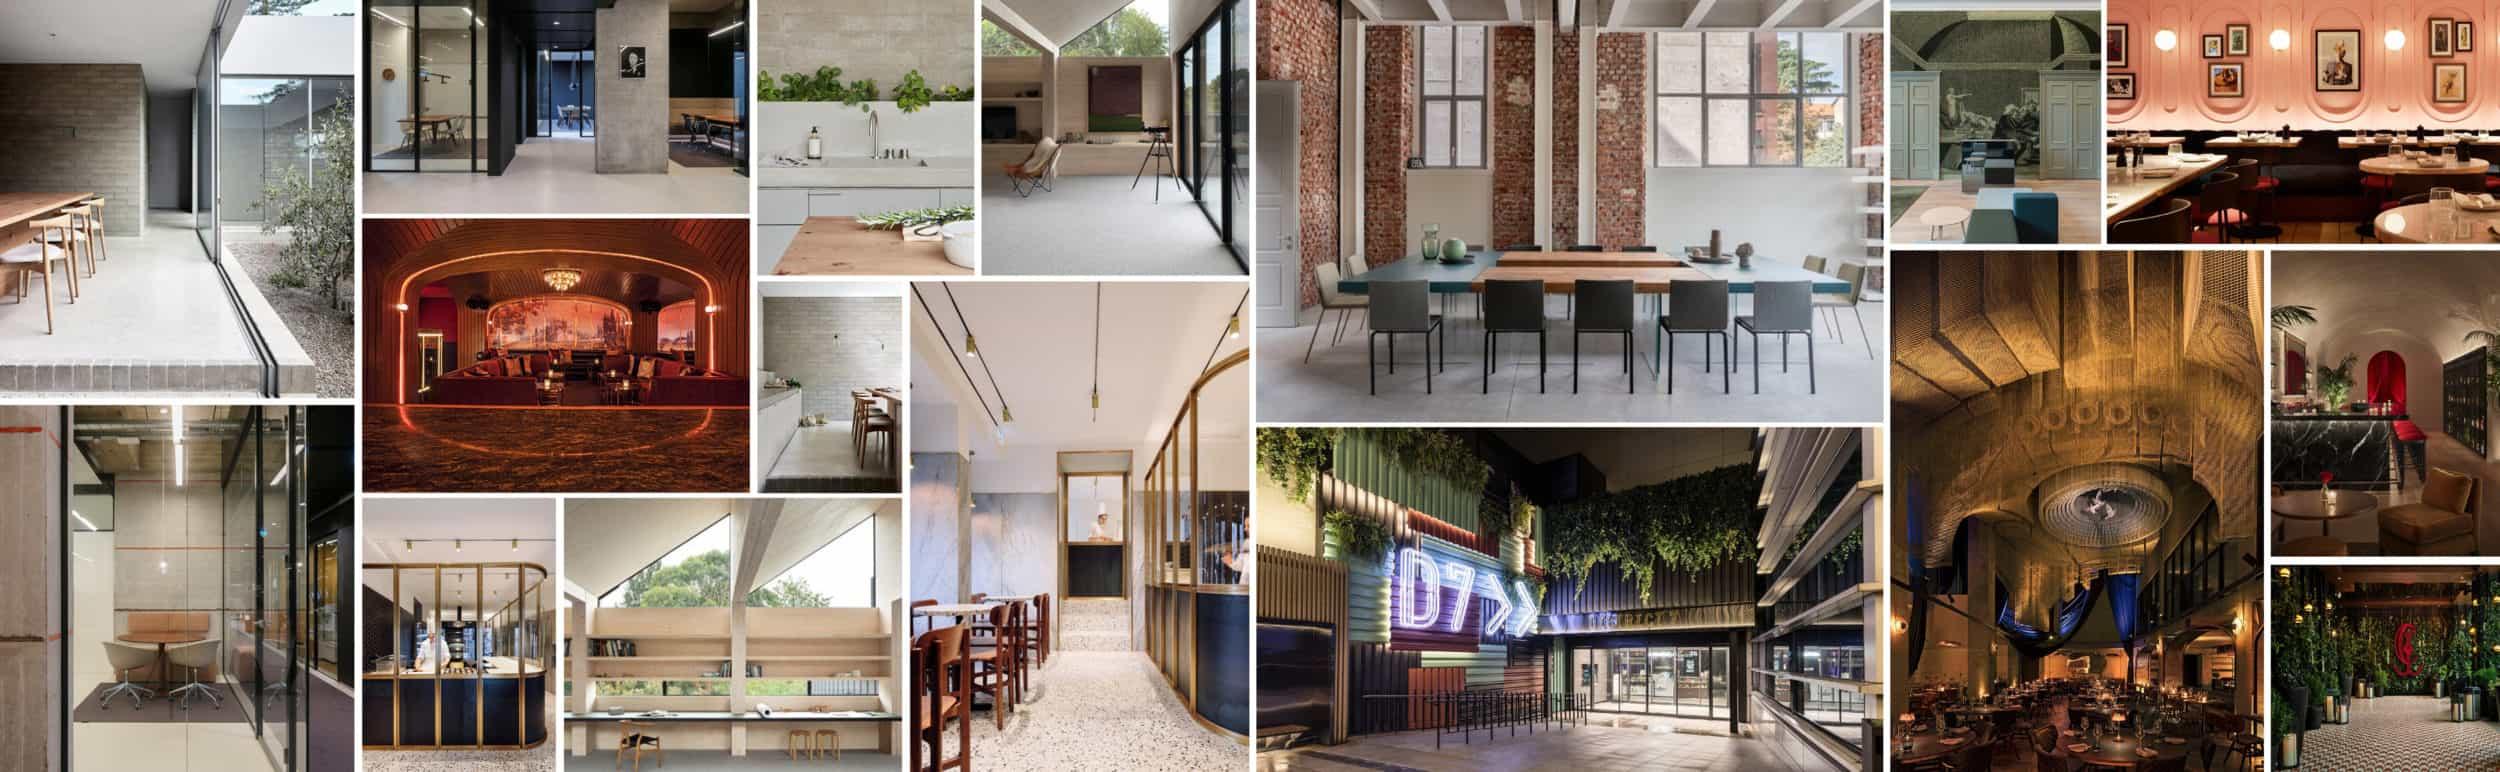 5 Key Commercial Design Trends For 2021